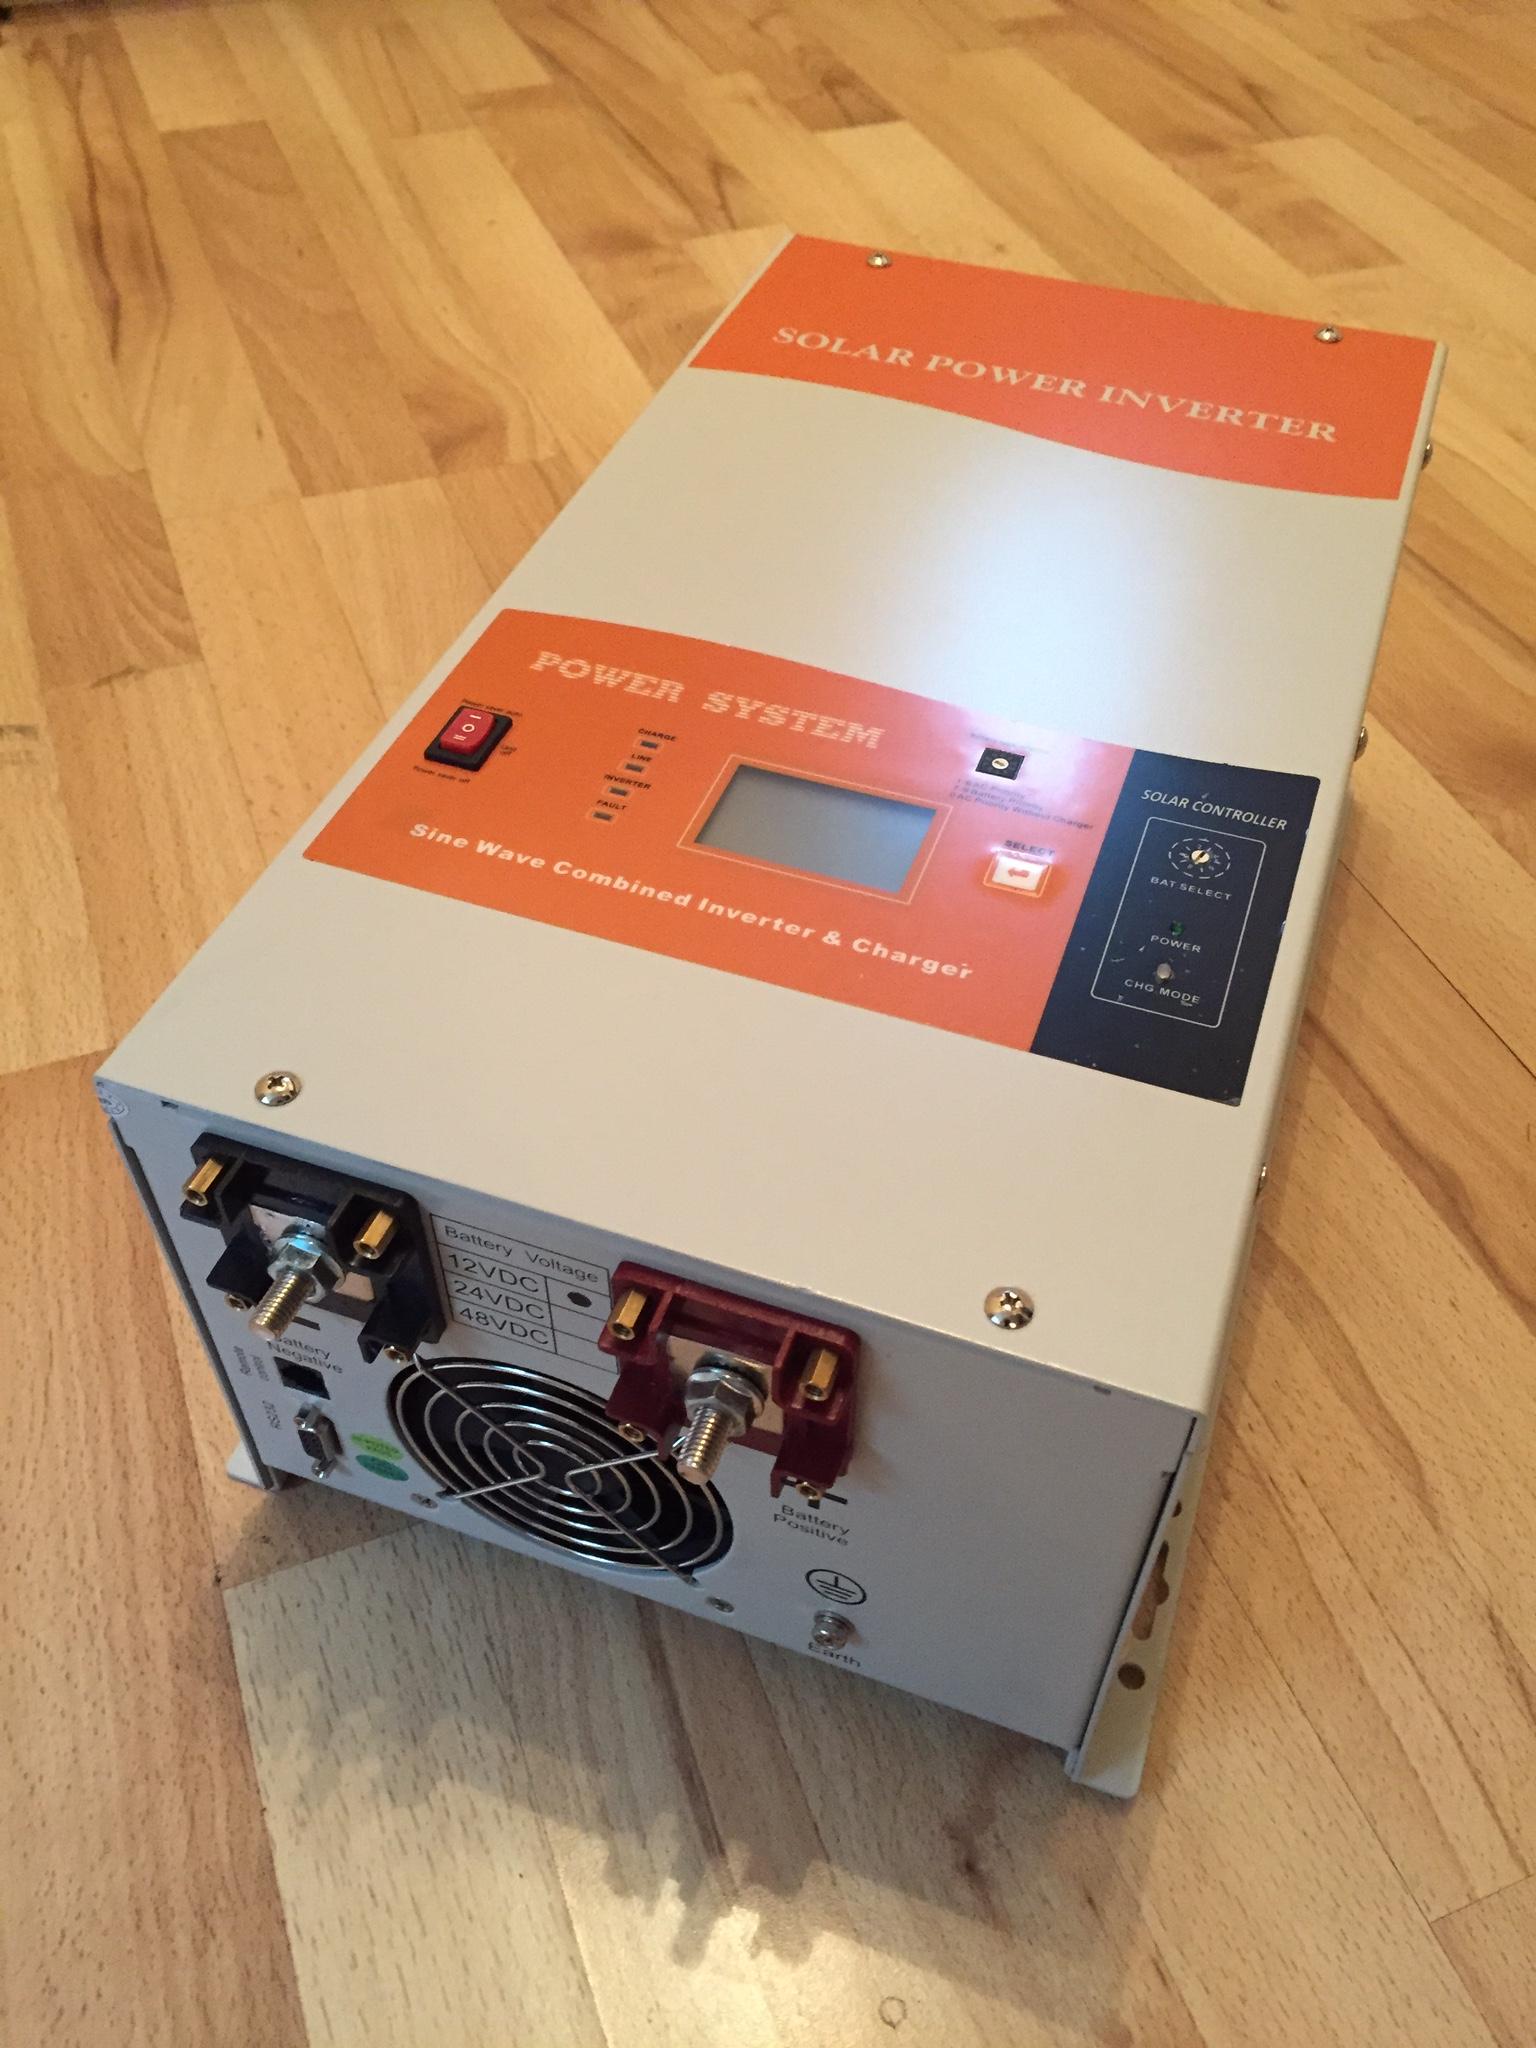 Vw Crafter Van Conversion 12vdc And 230vac Electrics Main Electrical Fuse Box Ebay Santak Ipv 2012c Inverter Charger Mppt